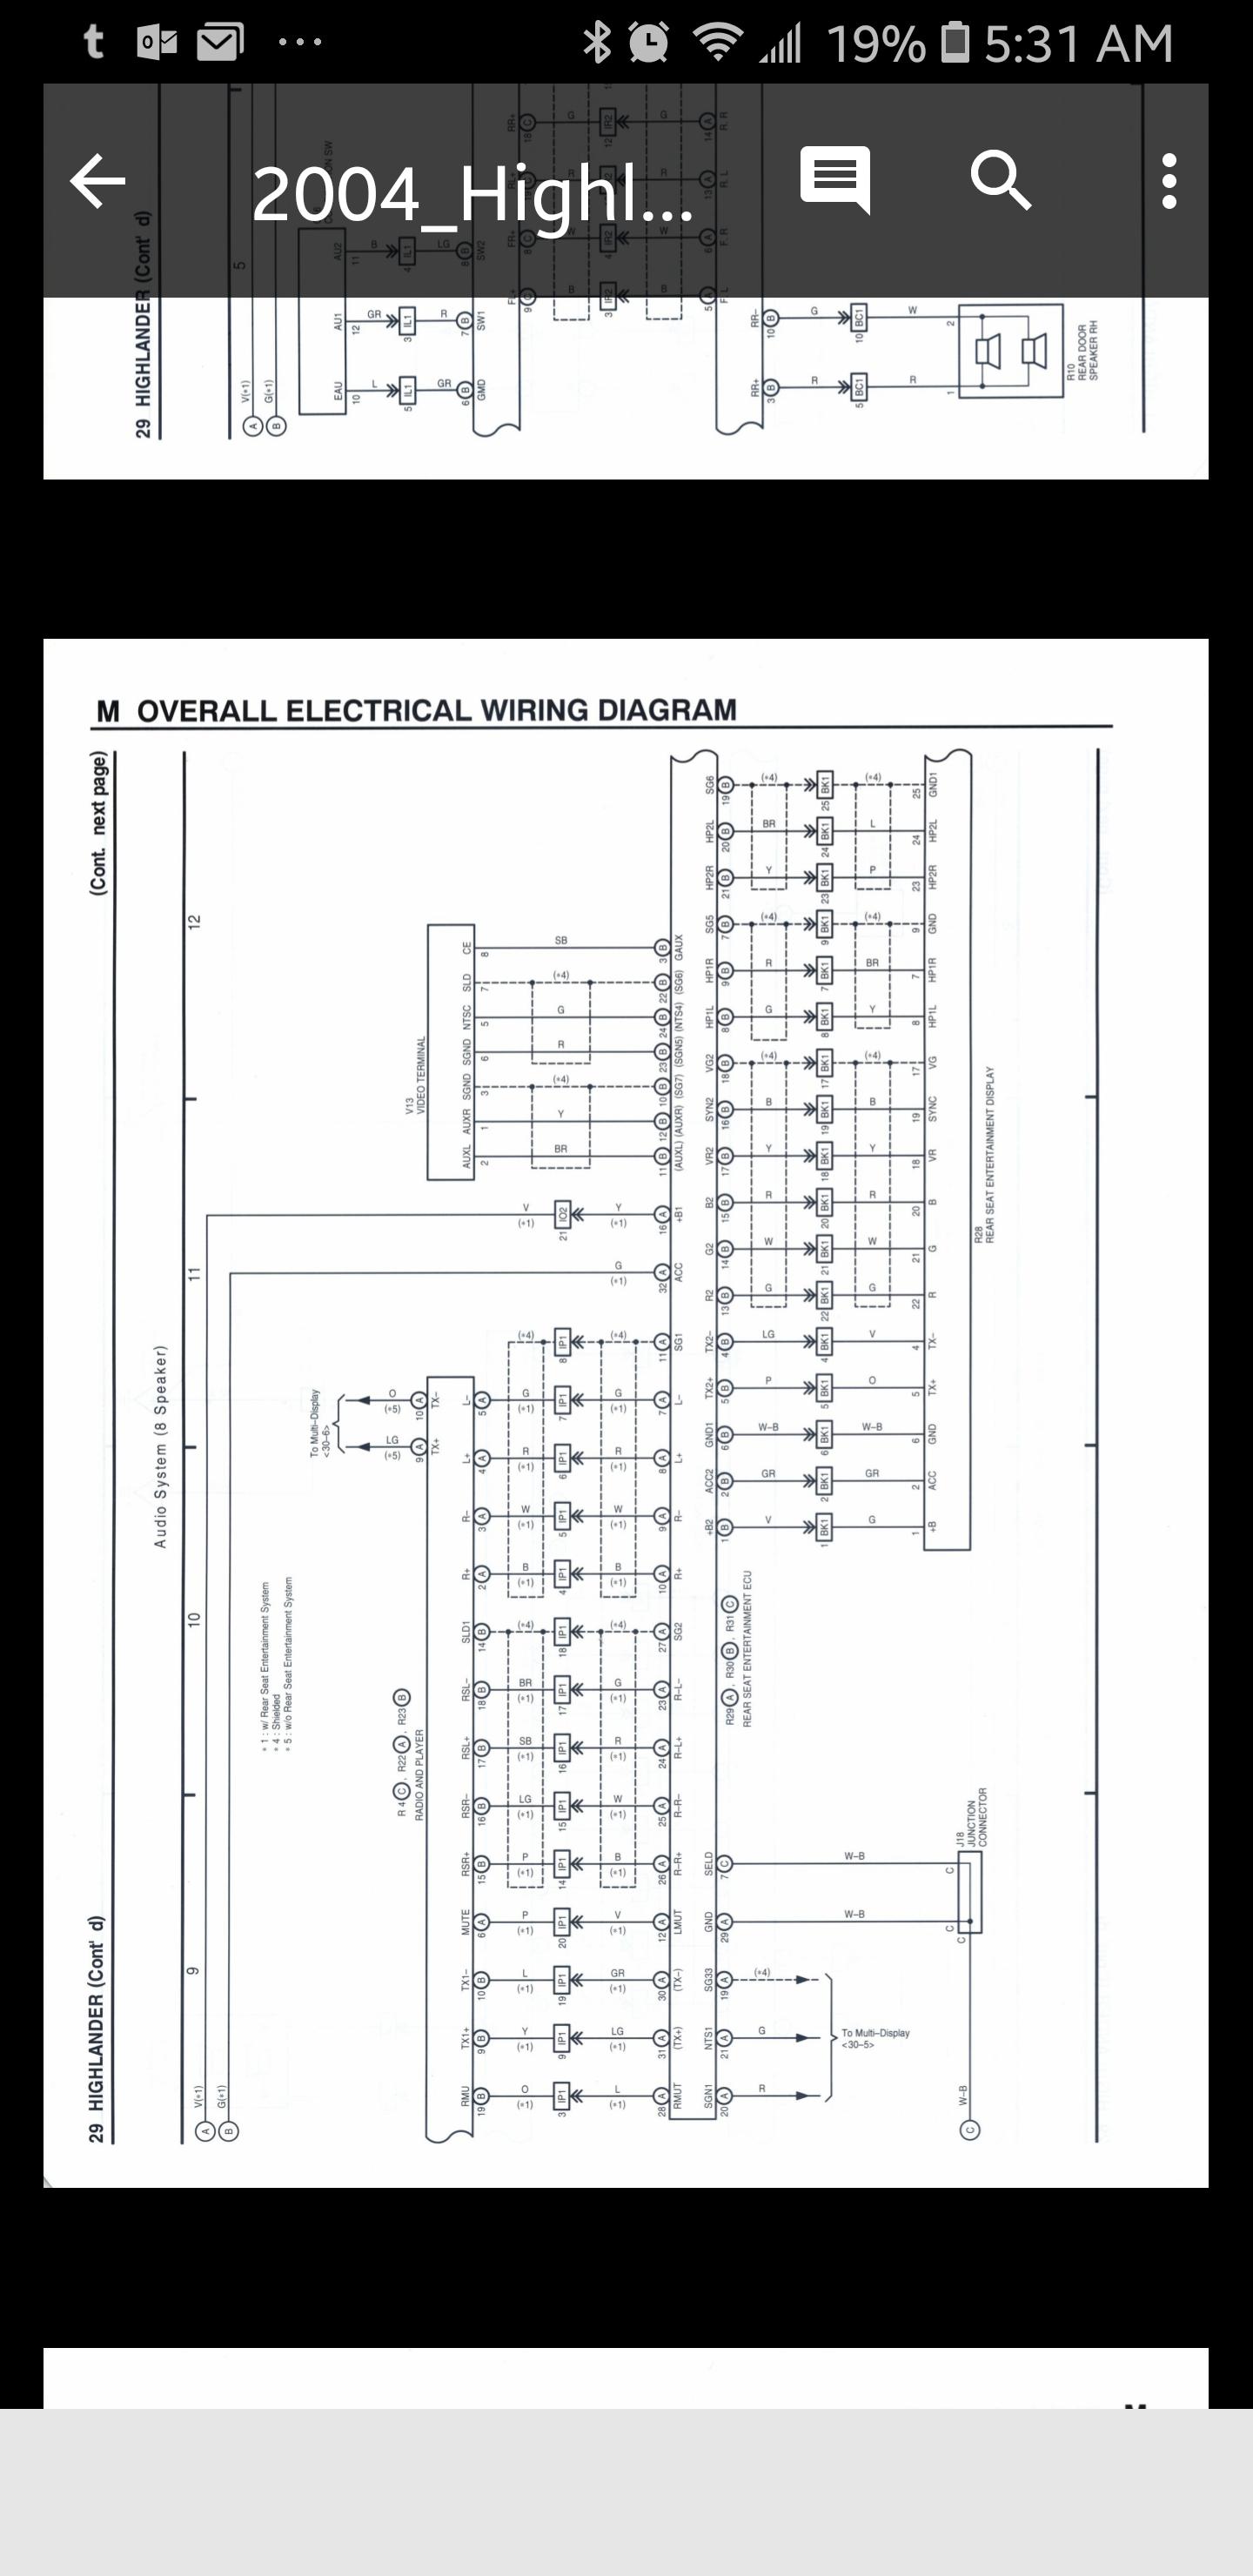 Highlander Stereo Wiring Diagram - Wiring Diagram